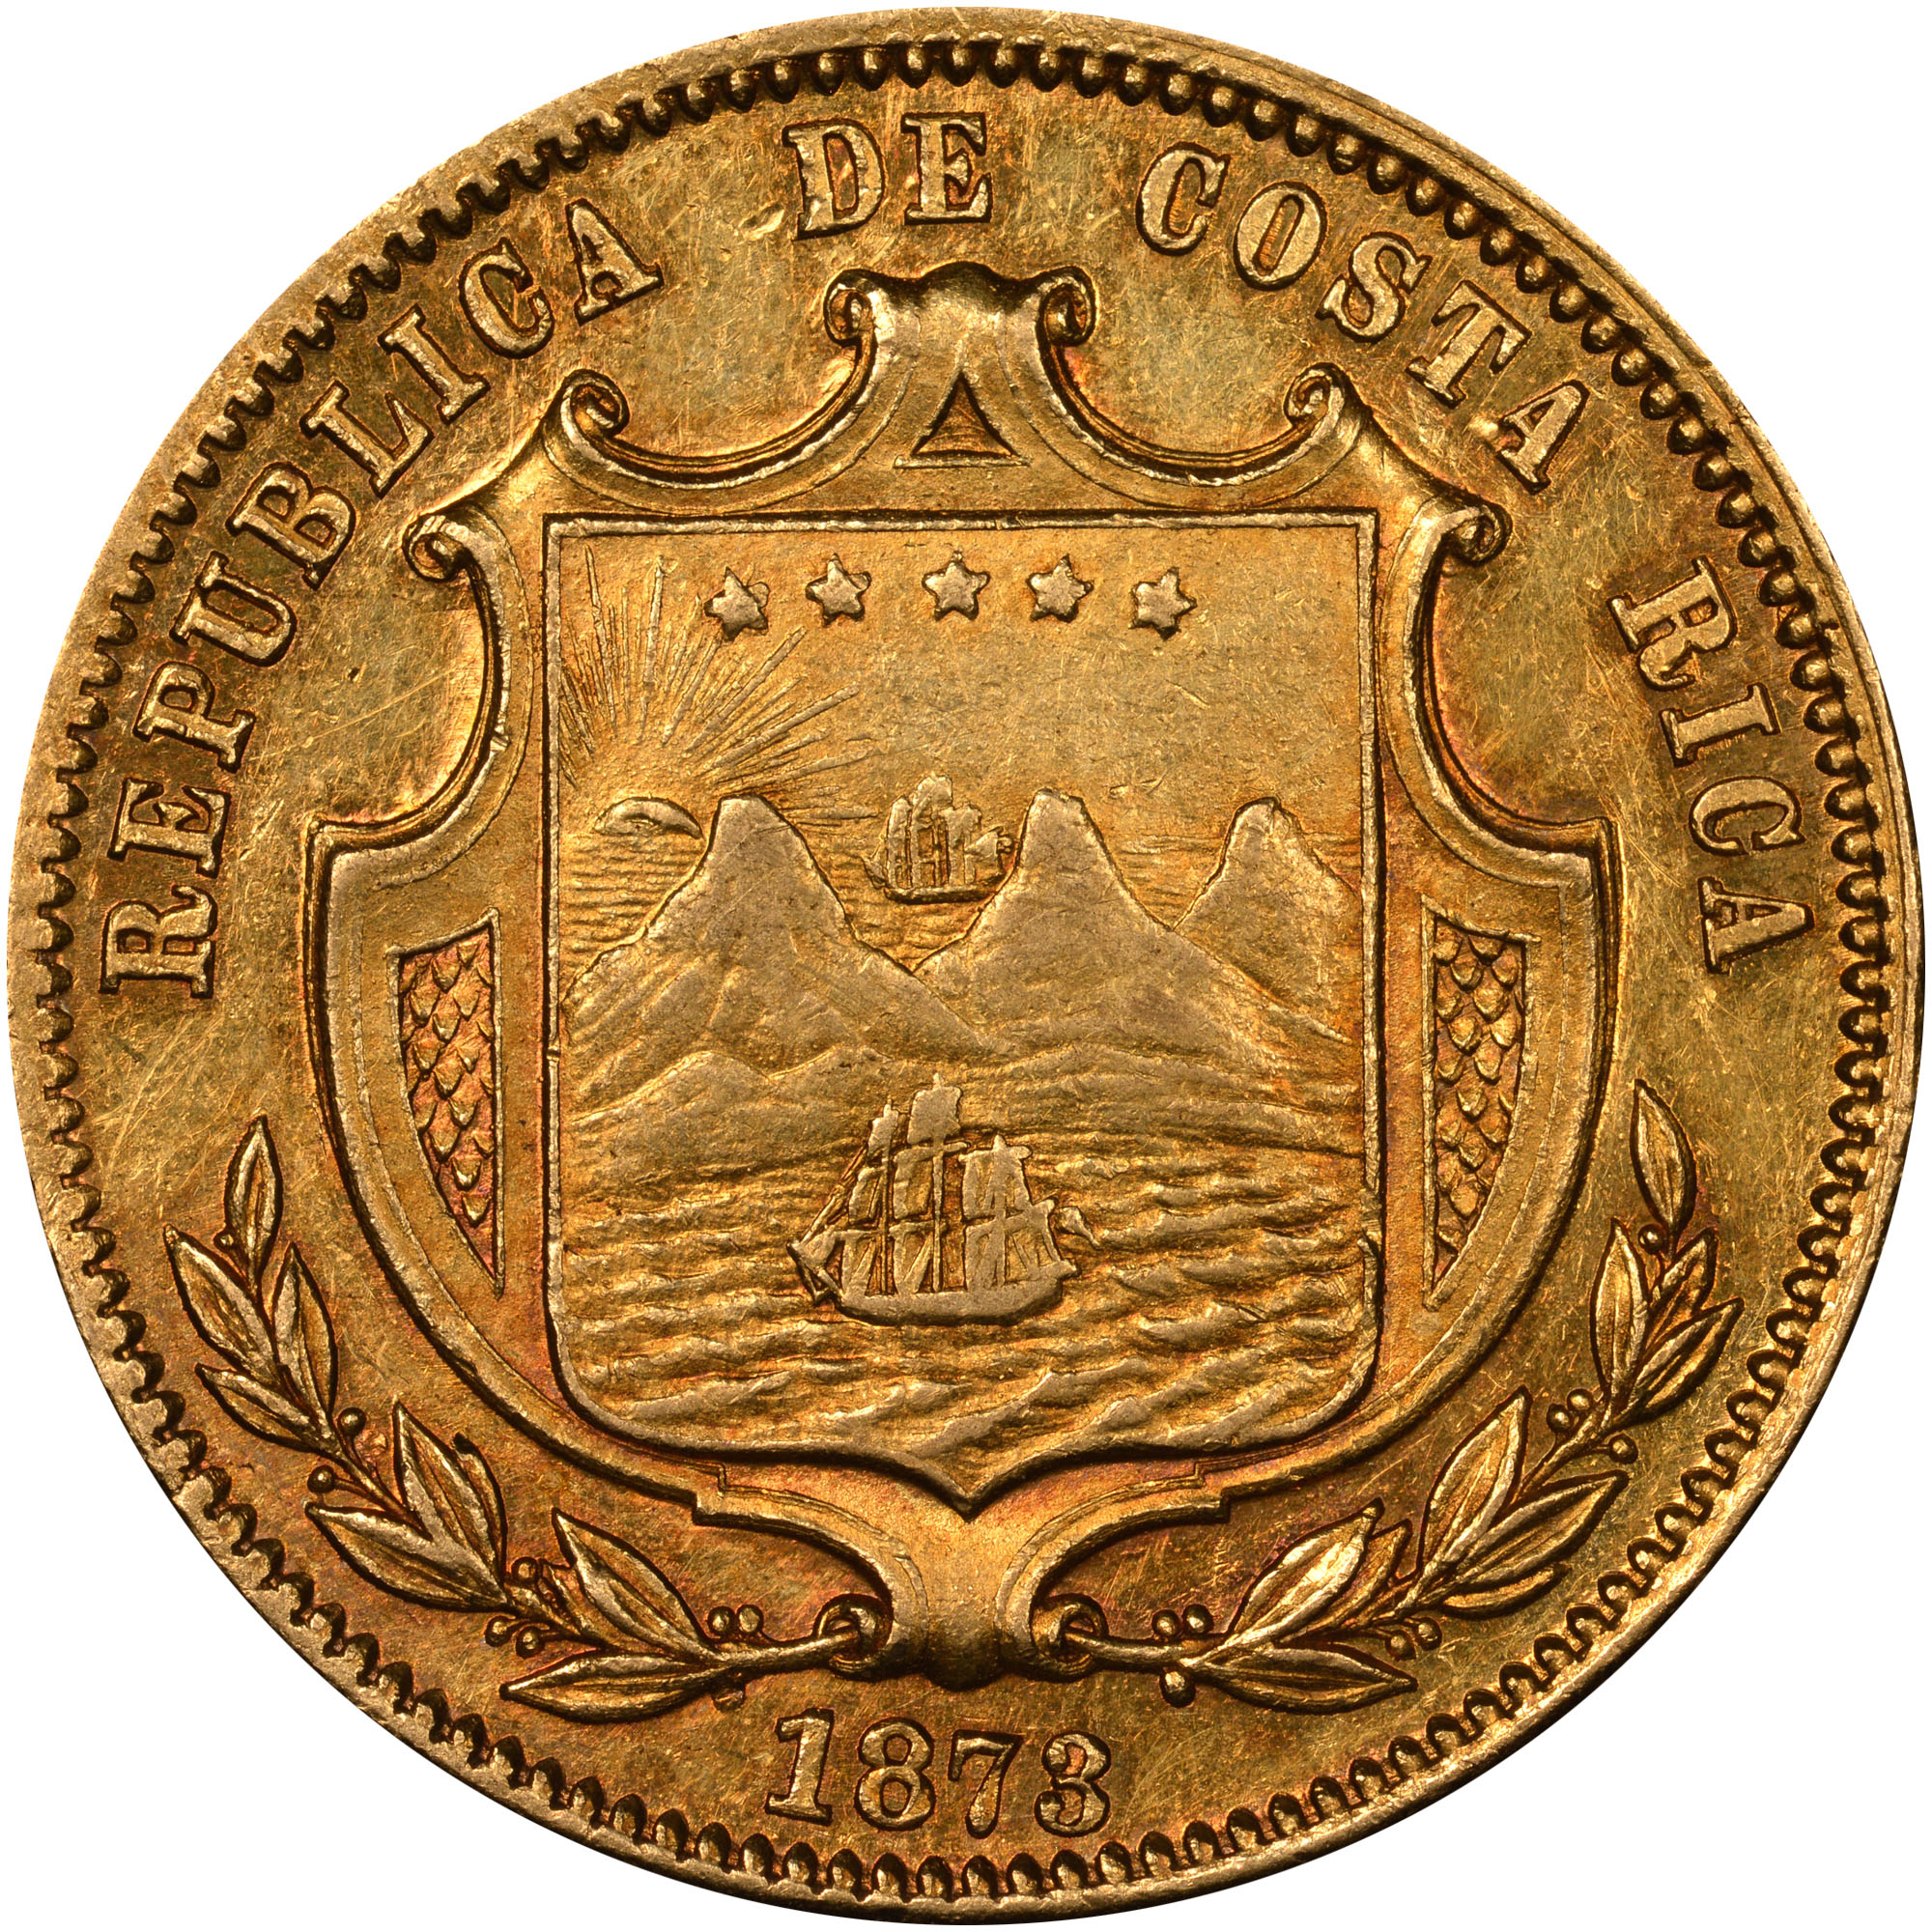 1873 Costa Rica 20 Pesos obverse